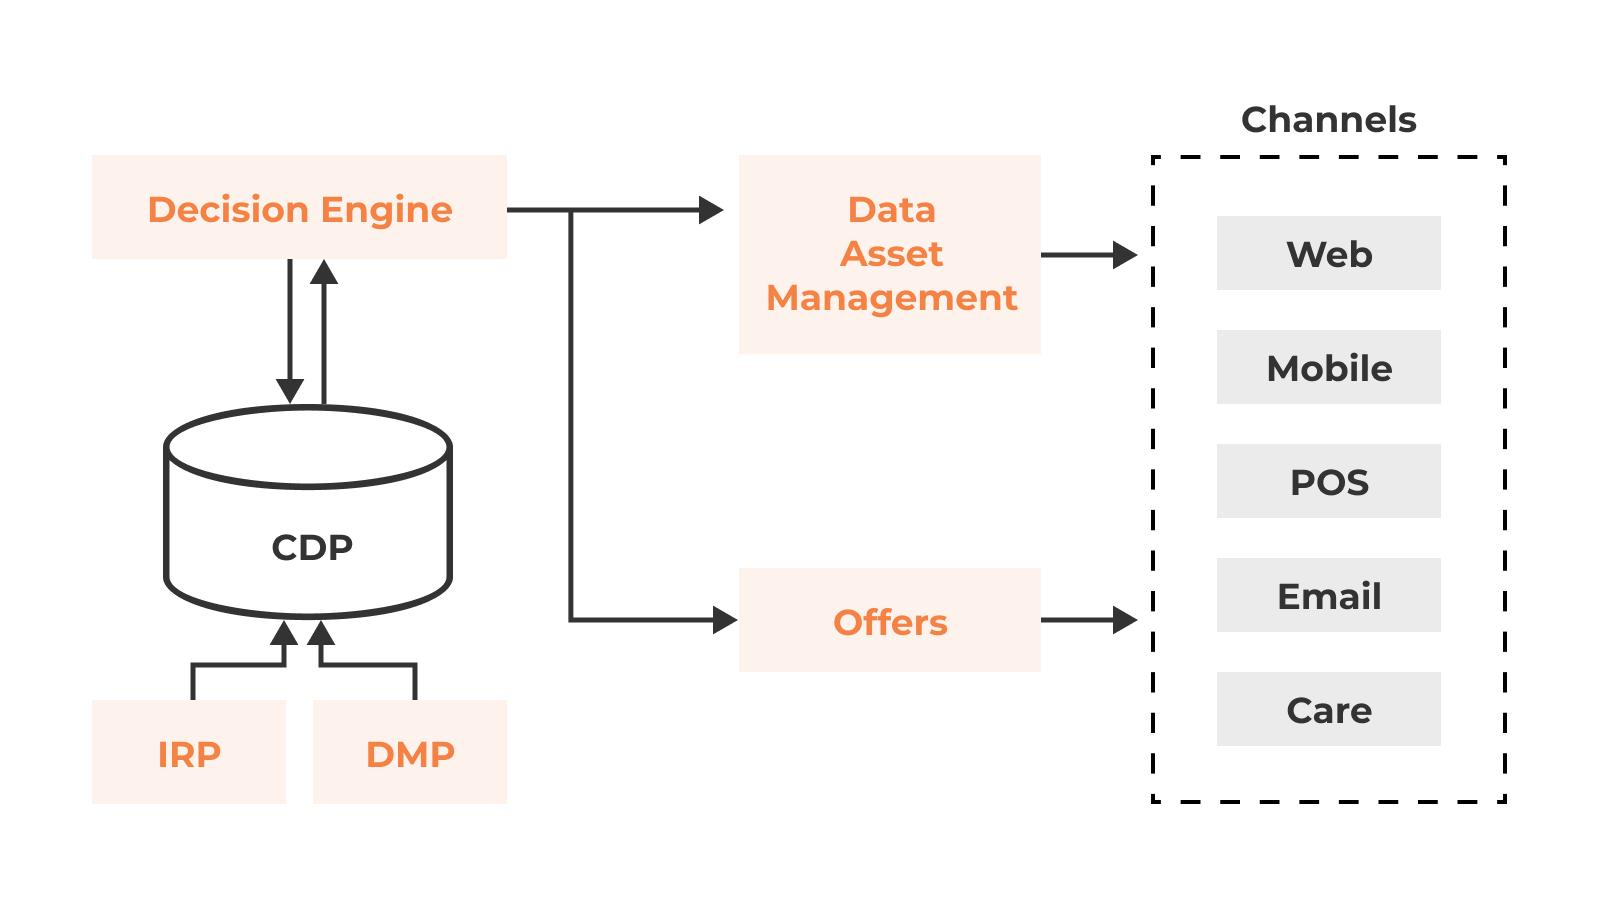 A diagram depicting personalization towards various digital channels